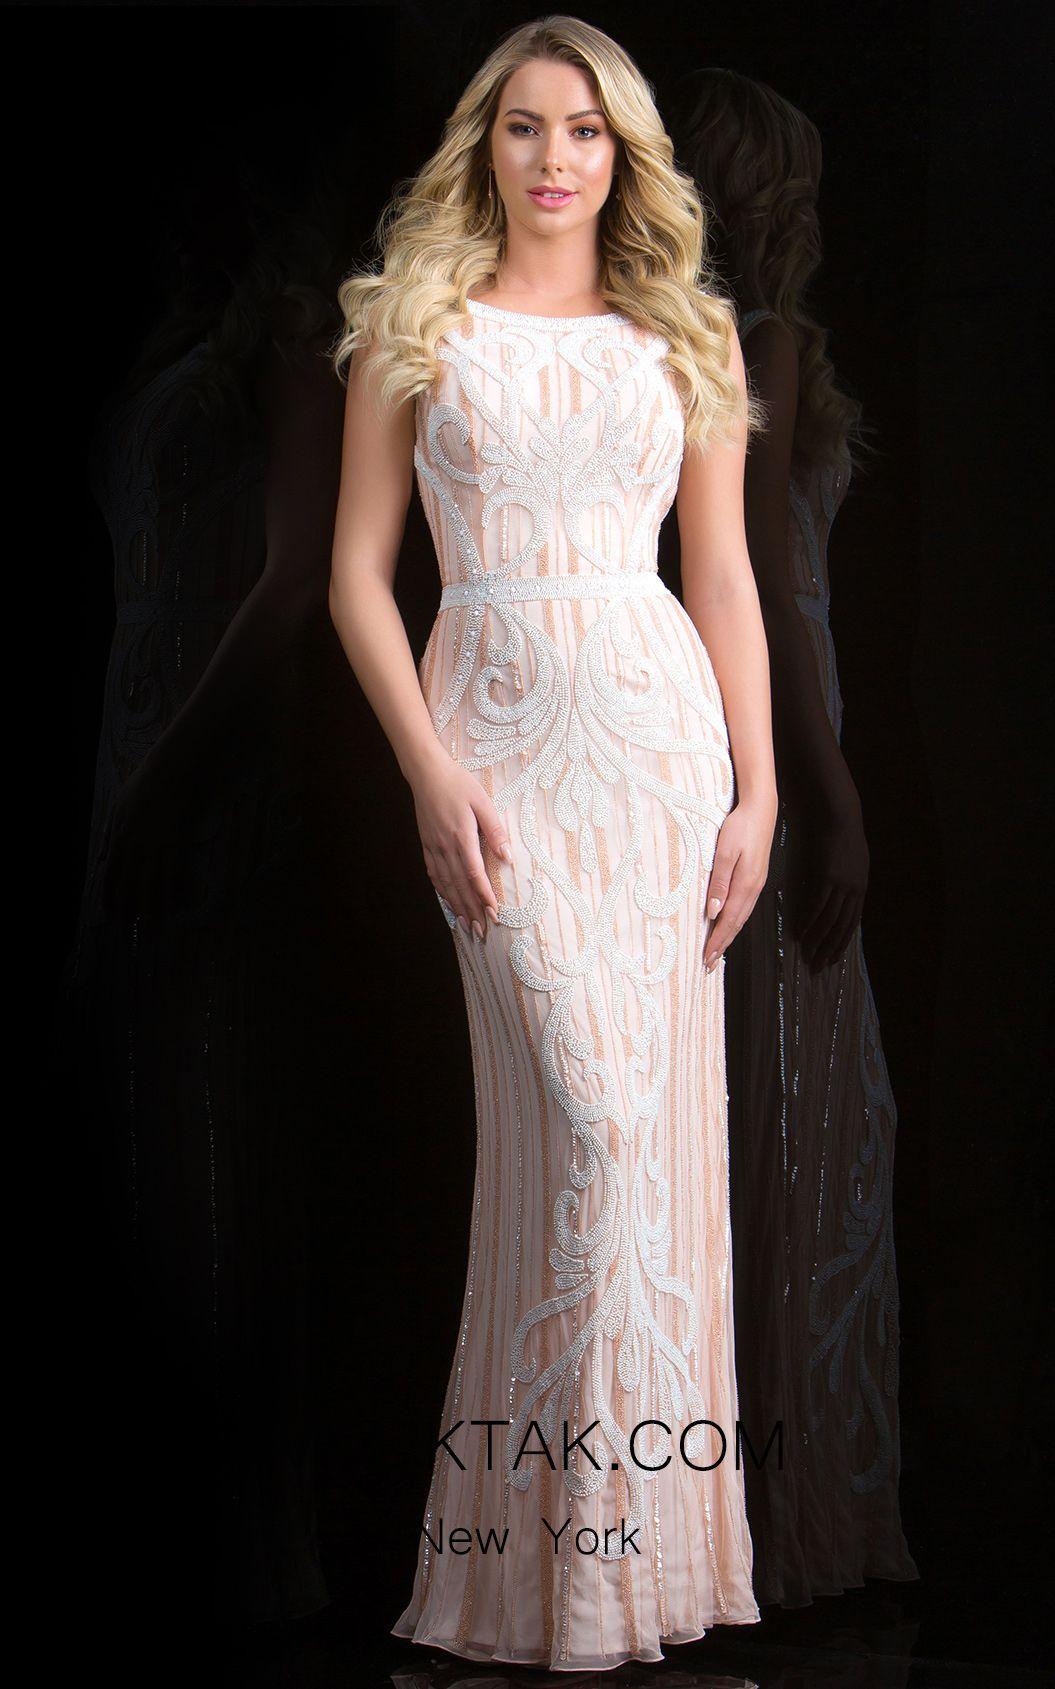 8b1204bb0ba Scala Style  48824 Dress at MackTak.com  Scala  Terani  MackTak   MackTakMart  Dress  Gown  NewYork  Prom  PromDresses  Prom2019  Scala48824